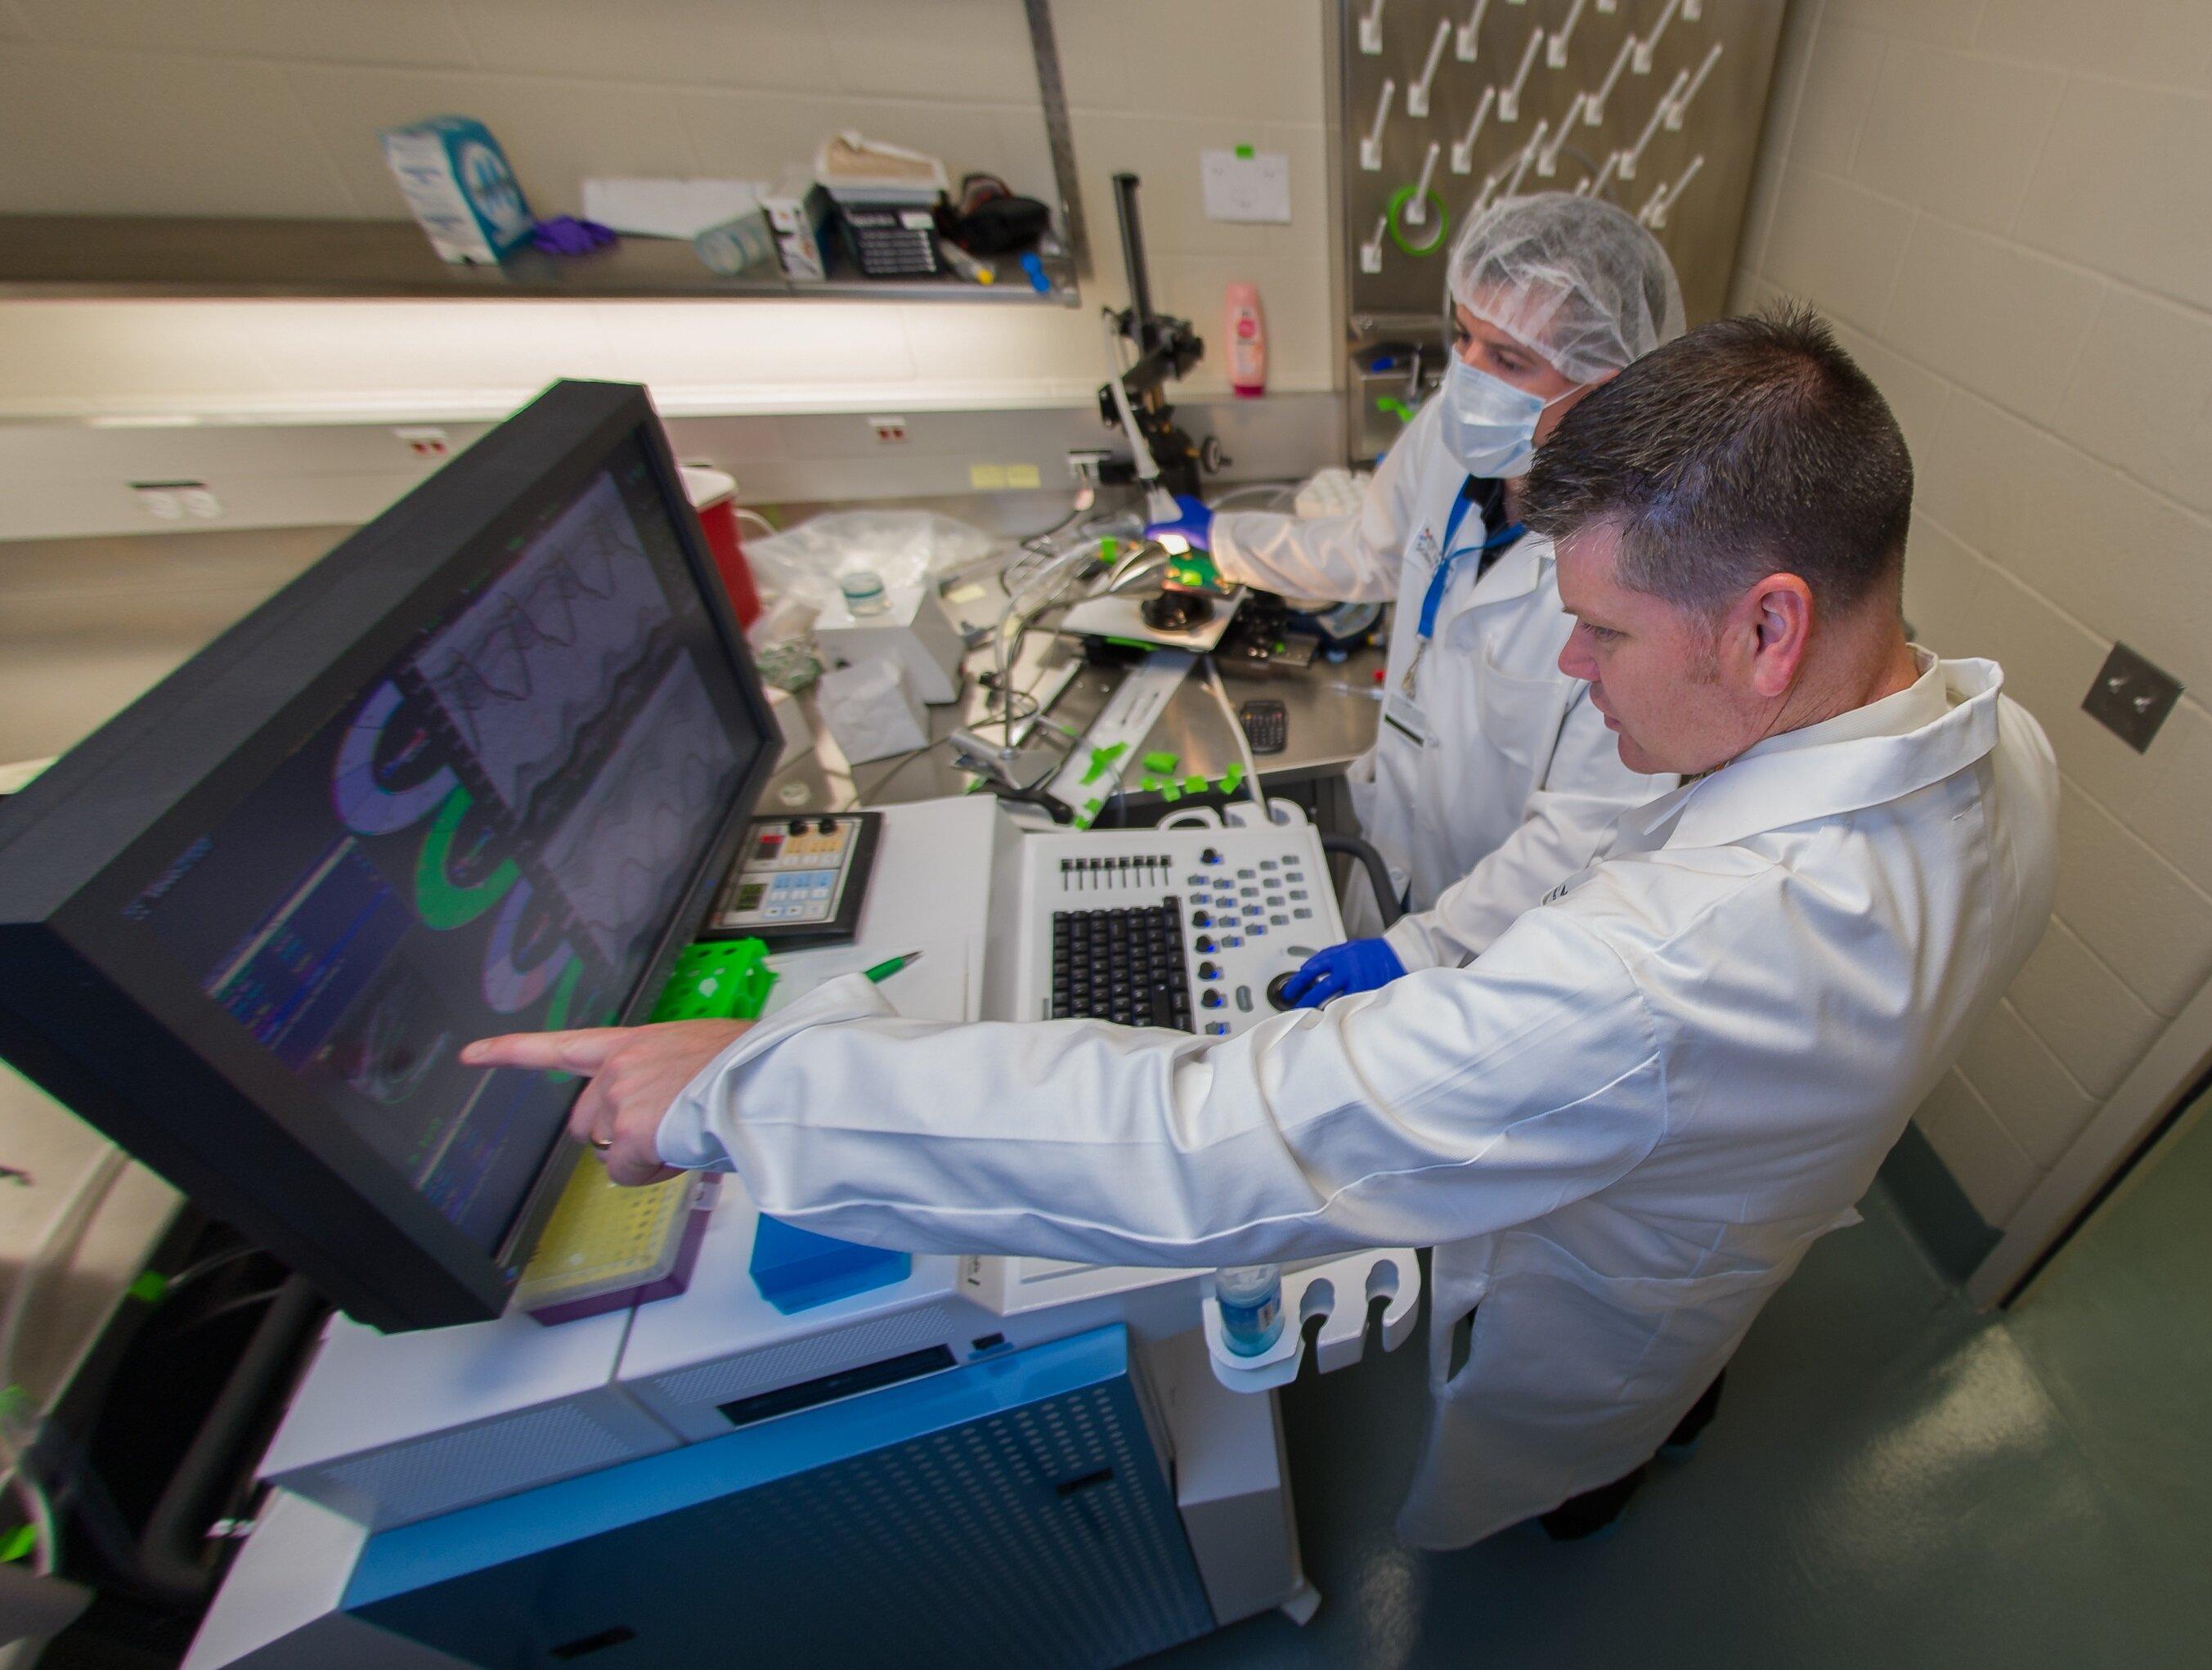 Study: Childhood chemo alters heart's caretaker cells